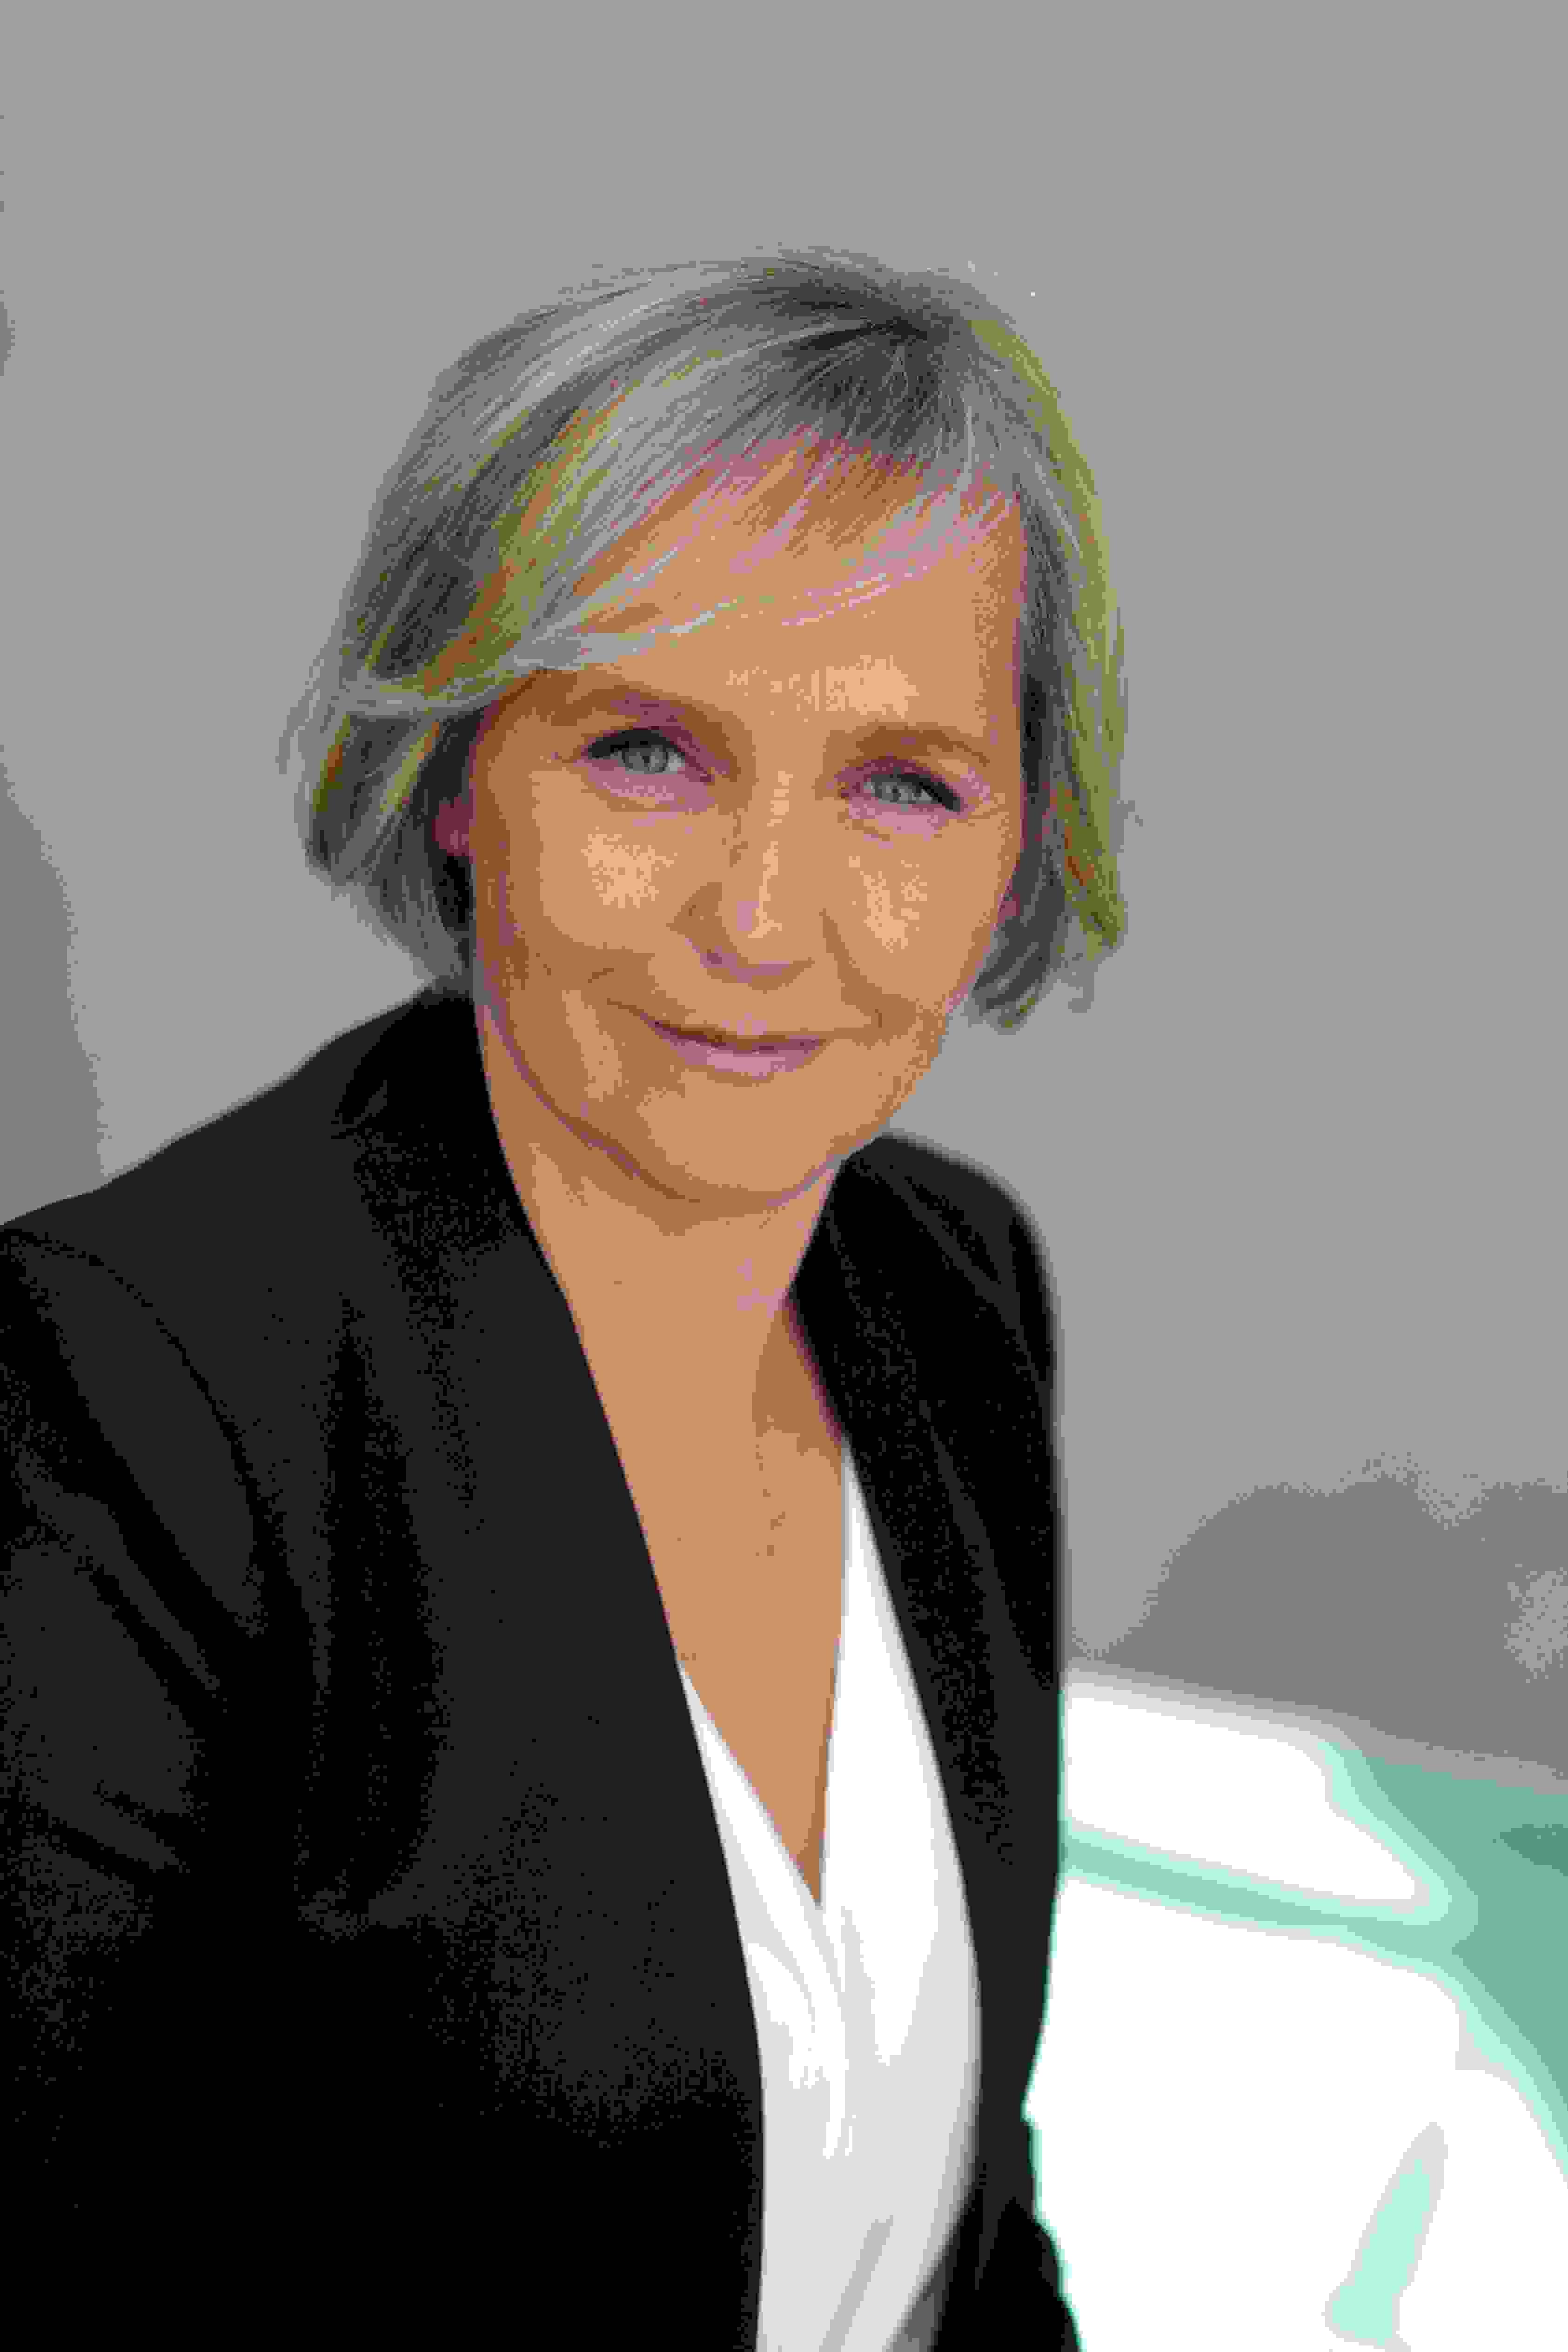 Sarah Ferguson: On Mother